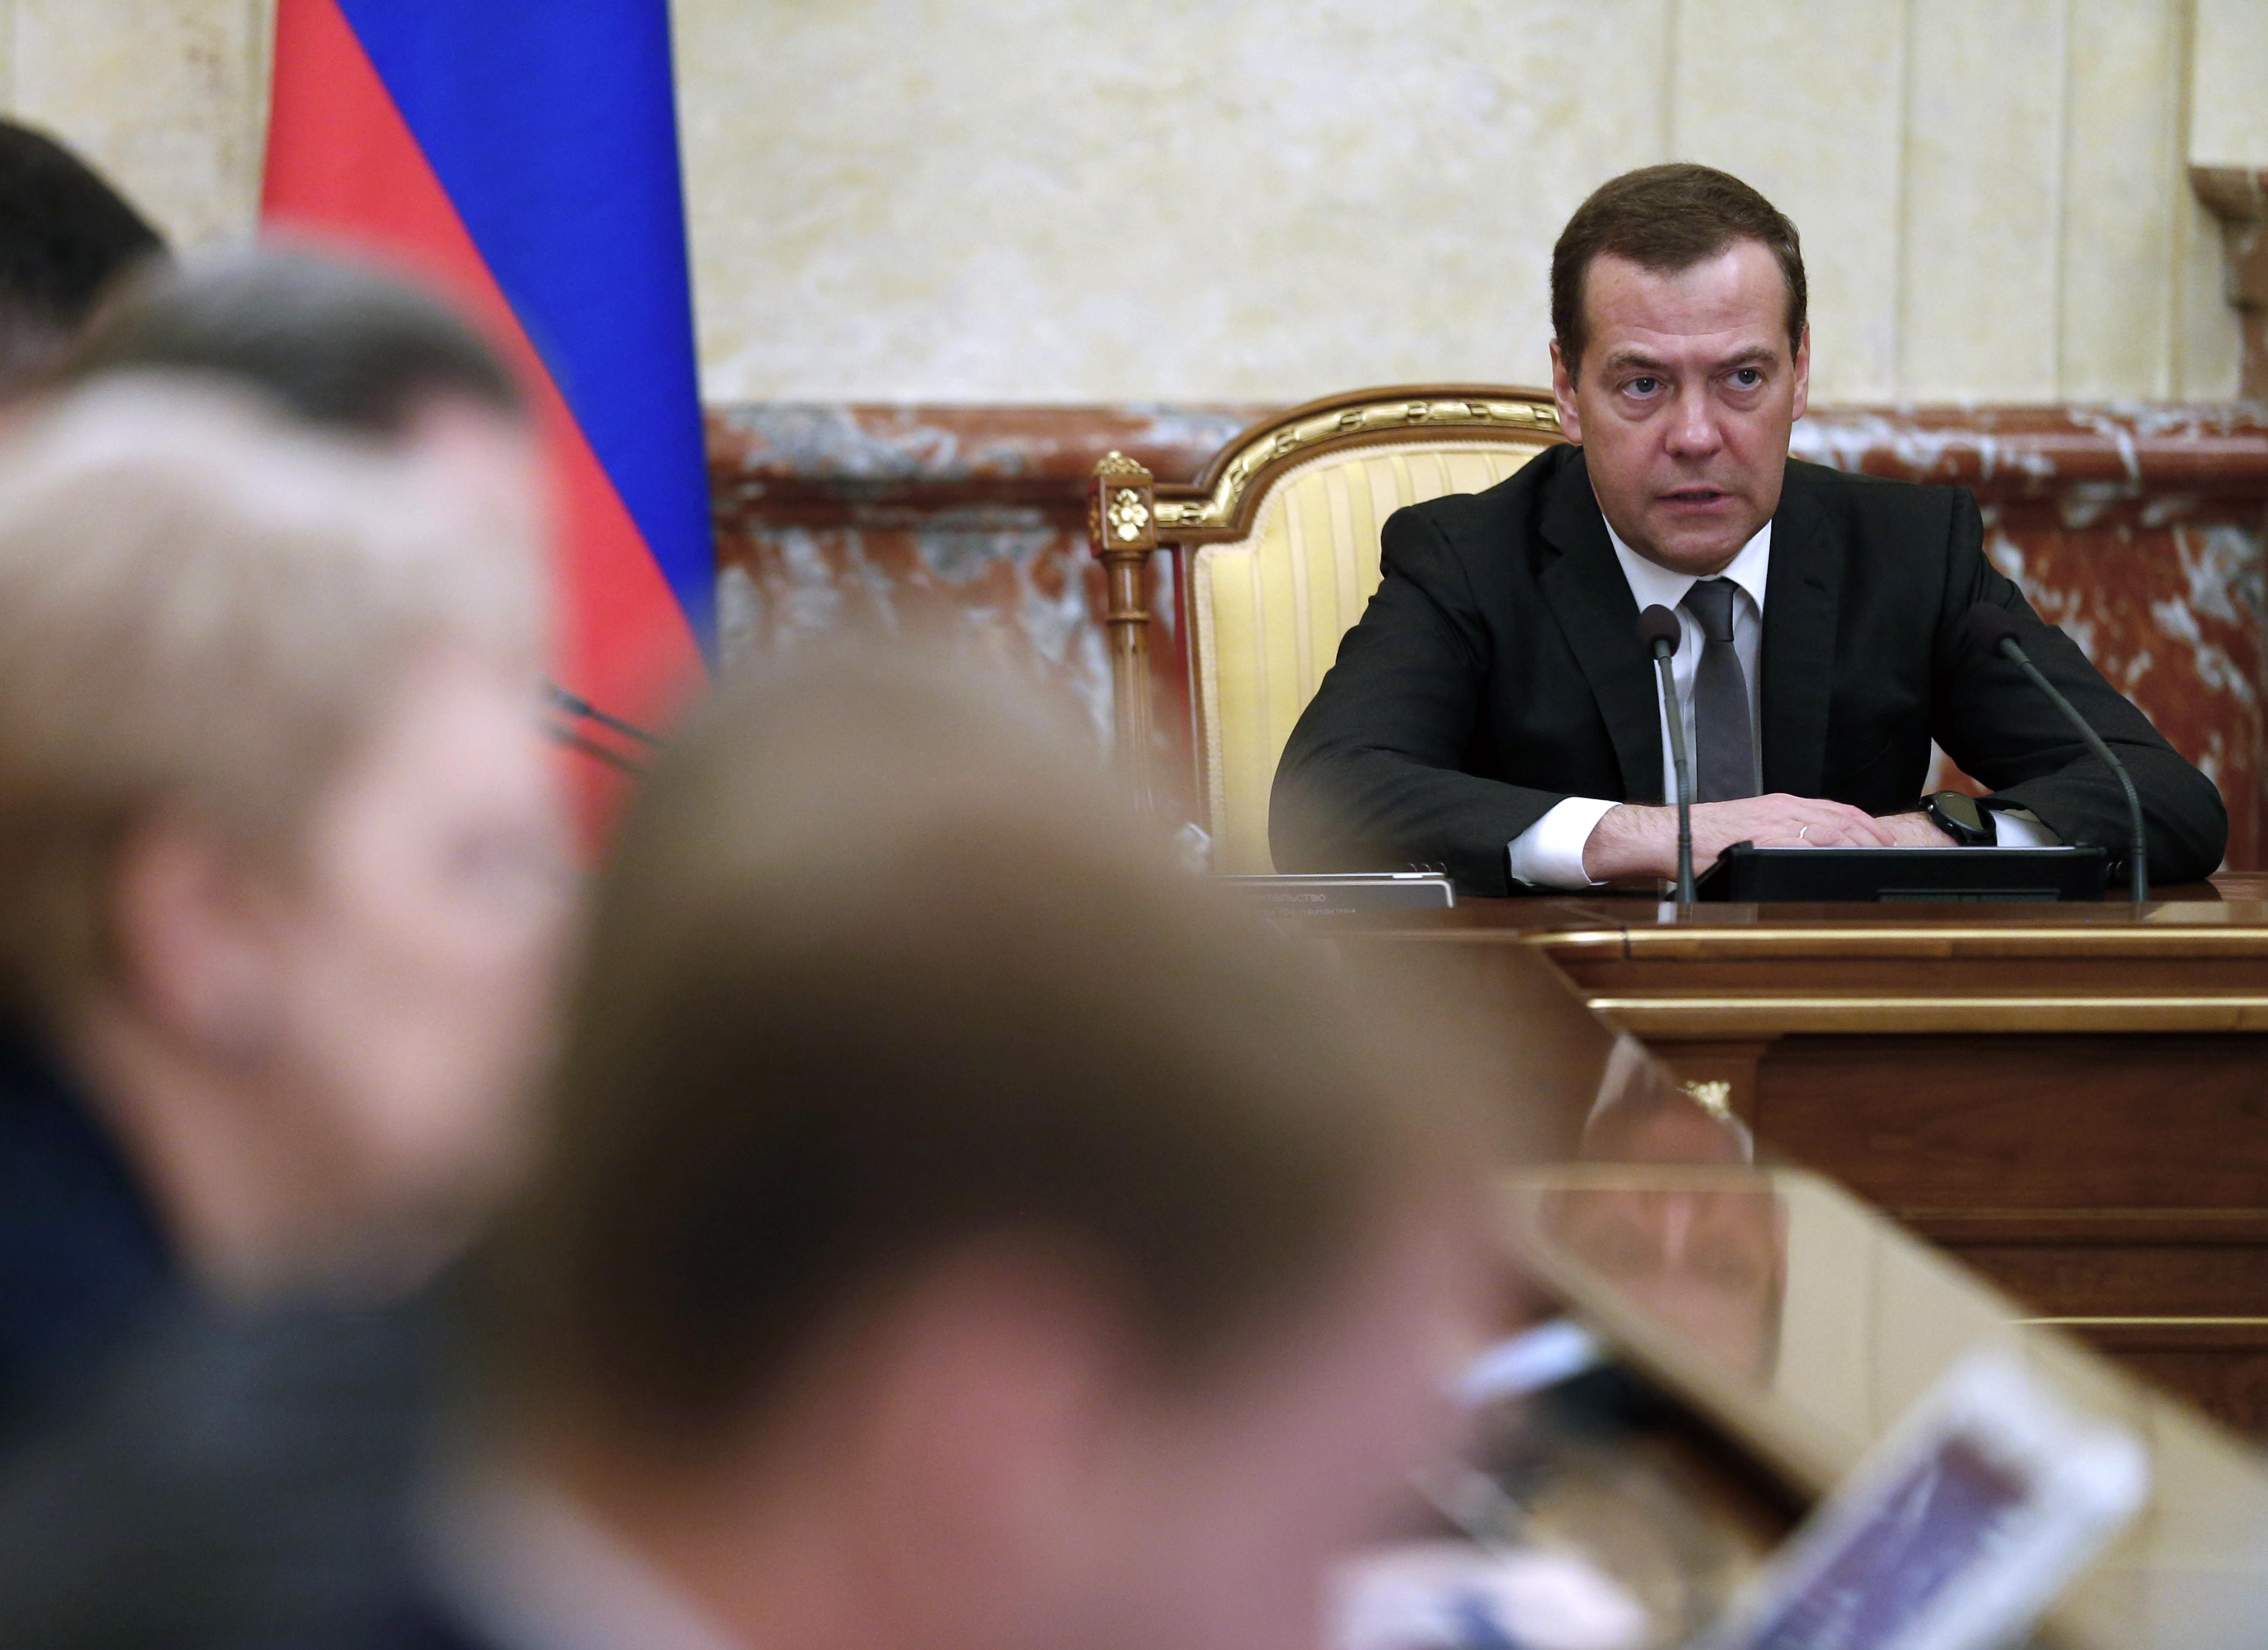 Фото © РИА Новости/Дмитрий Астахов